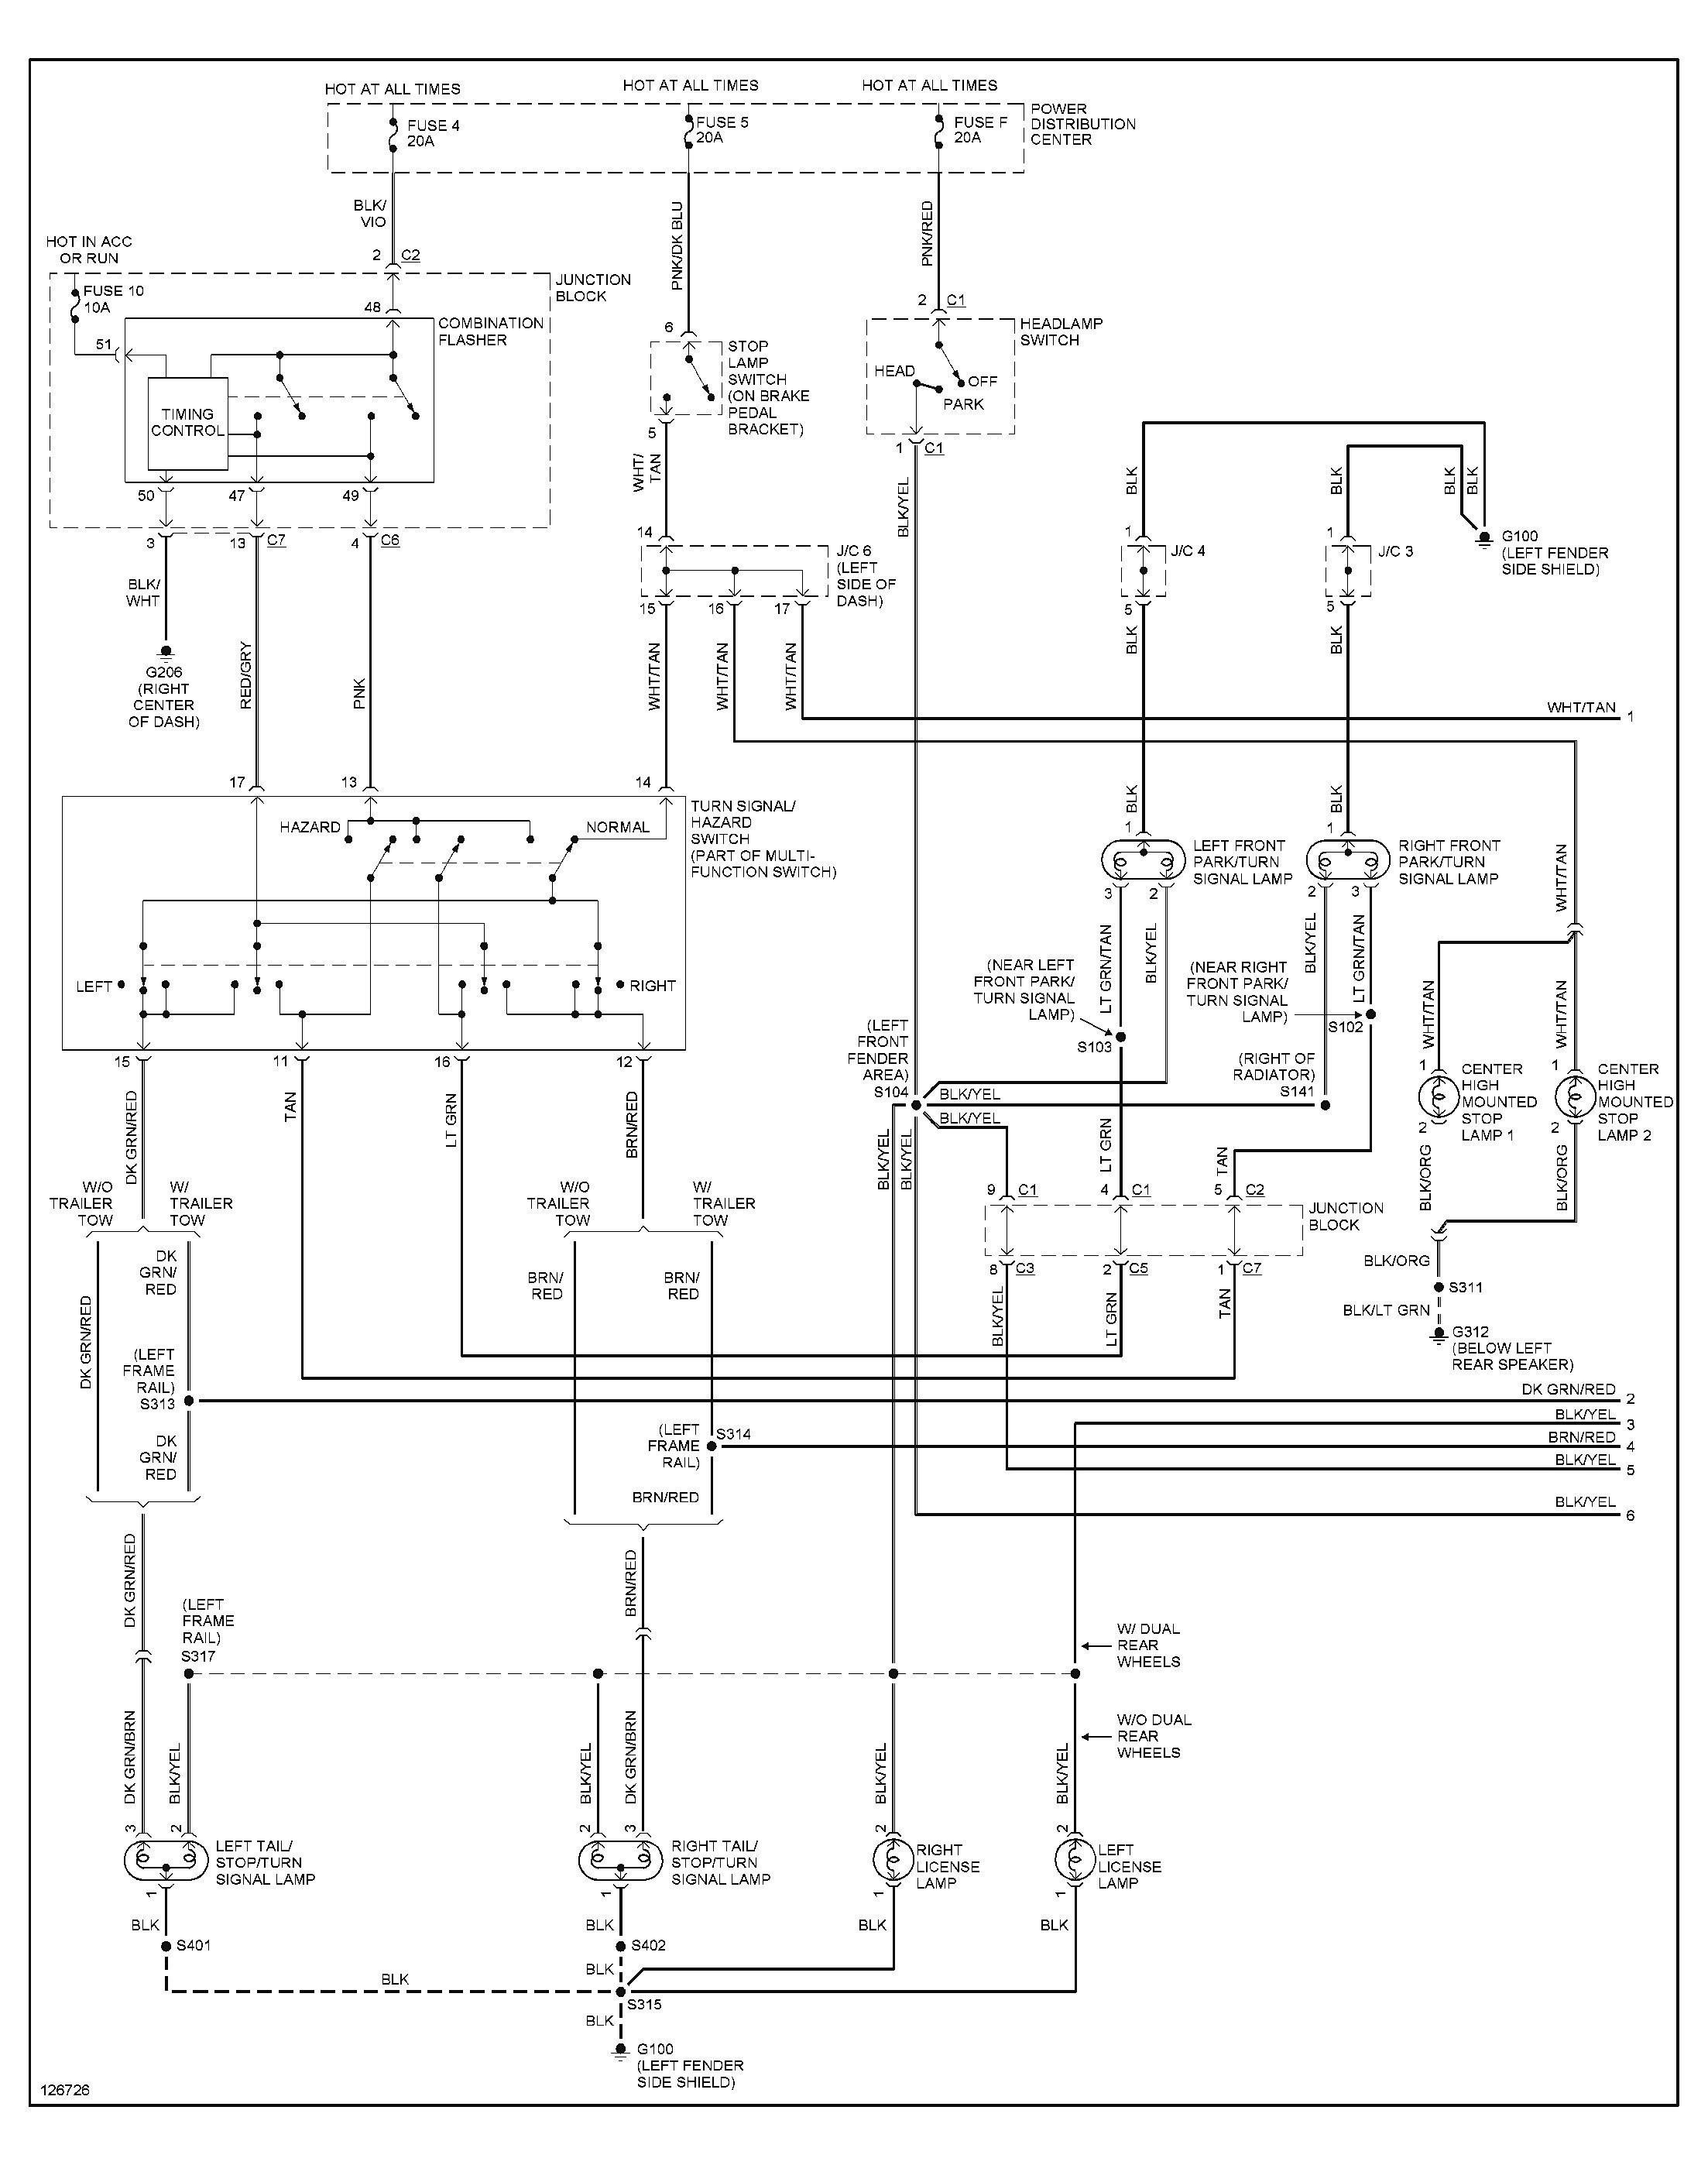 2004 dodge stratus engine diagram 2004 dodge ram dually 3500 wiring diagram  experts wiring diagram •